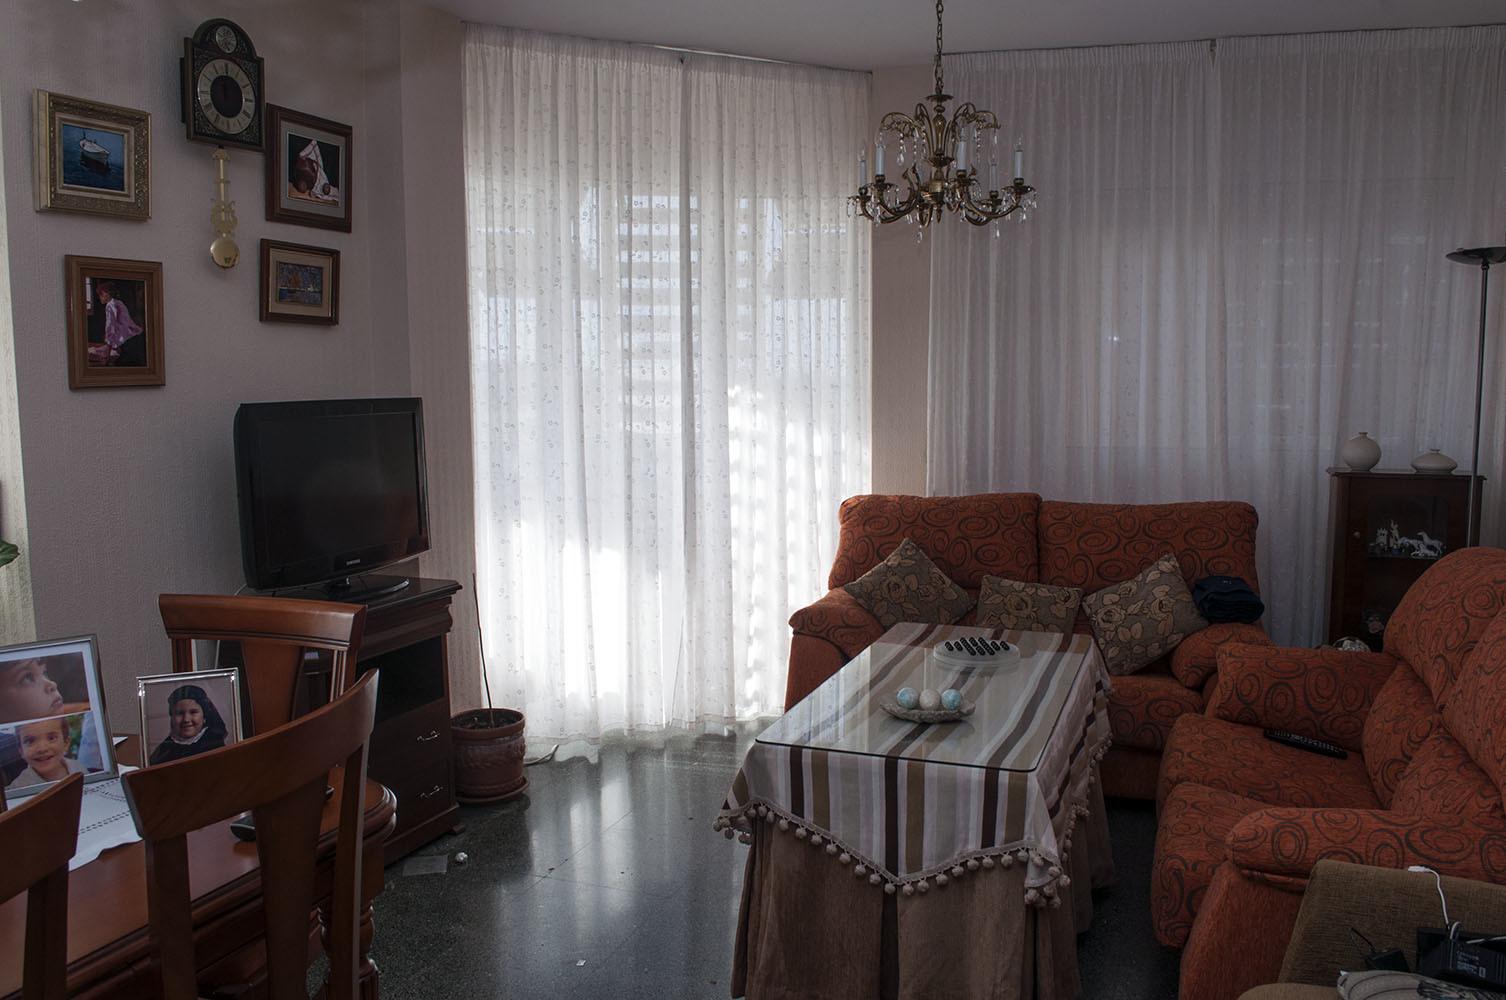 se-alquila-habitaciones-amplias-luminosa